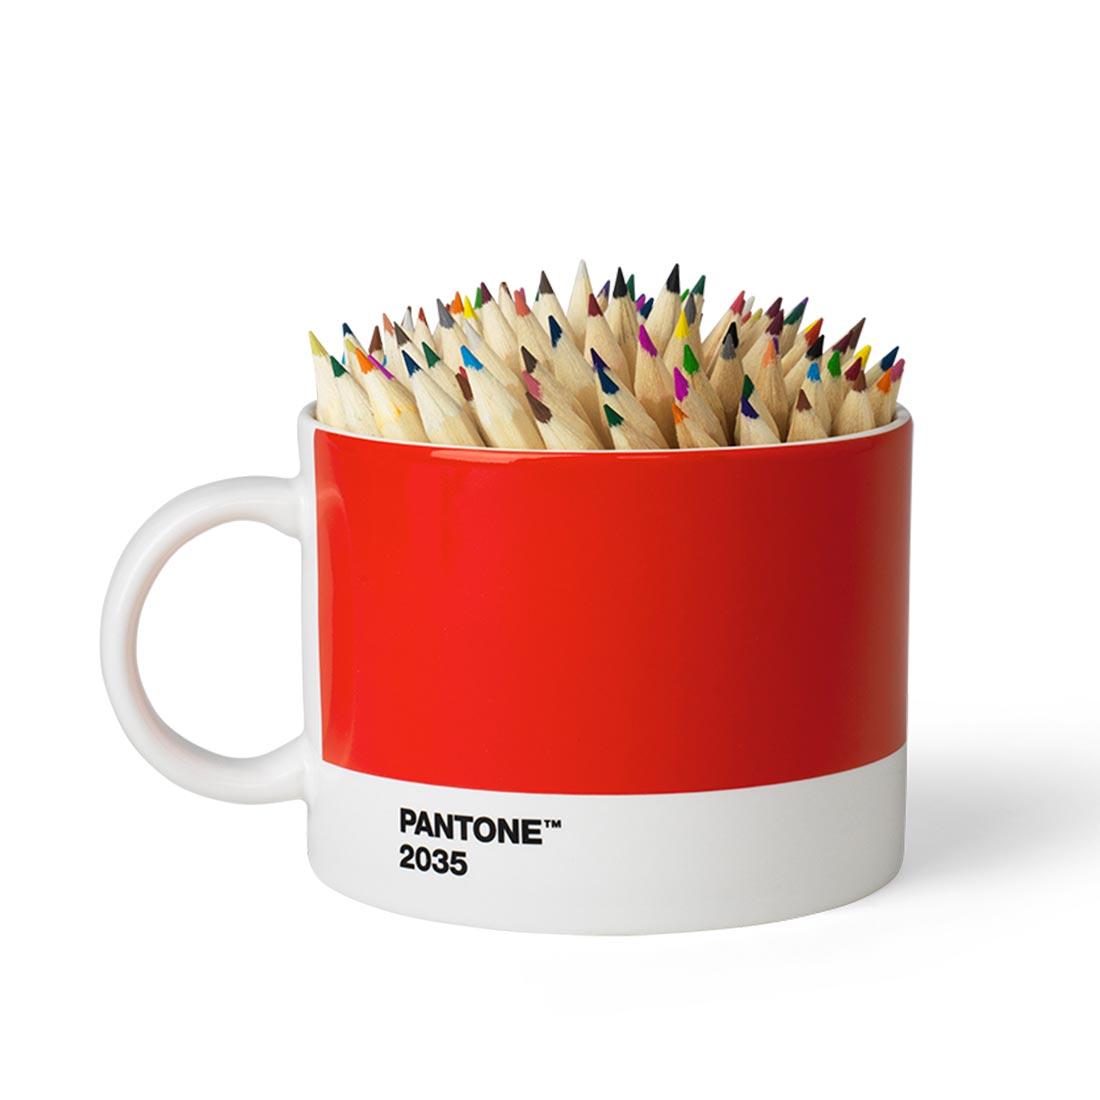 pantone-teetasse-milchkaffeetasse-2035-lichtraum24